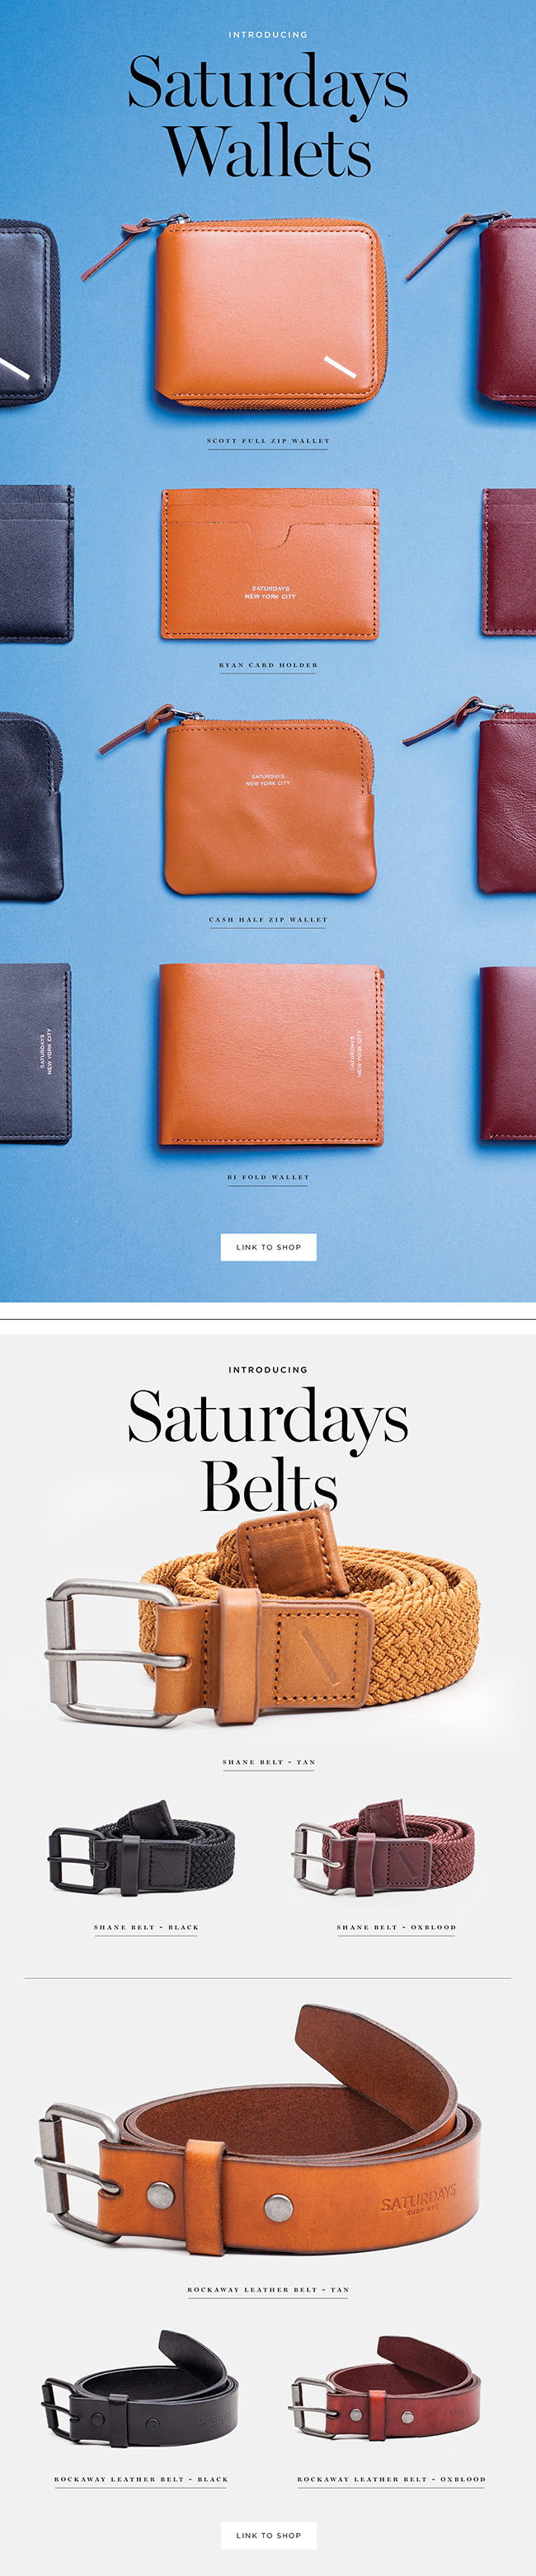 Saturdays NYC - New Accessories